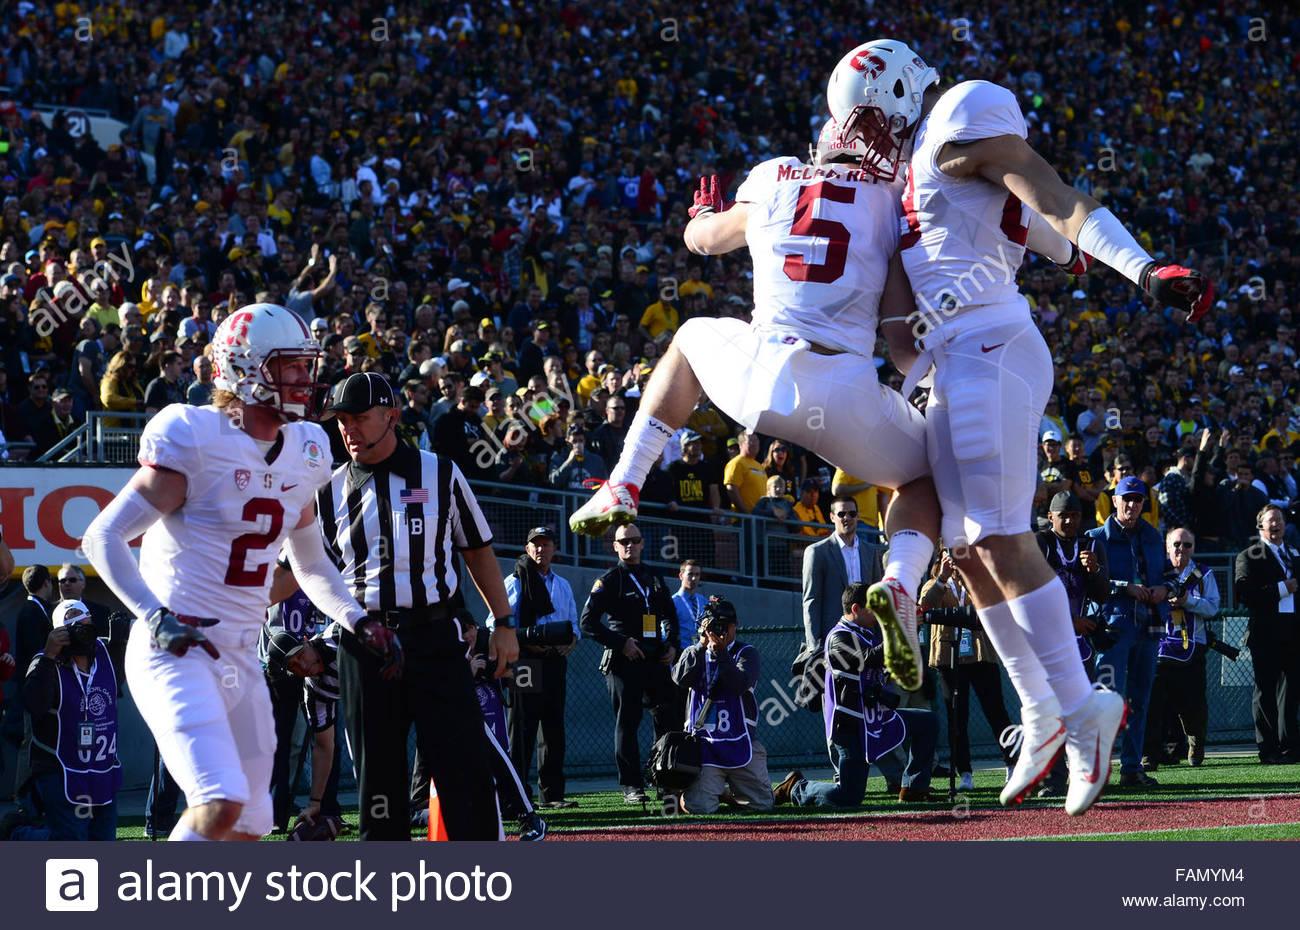 Pasadena, California, USA. 01st Jan, 2016. Stanford running back Christian McCaffrey (5) after a 75 yard touchdown - Stock Image